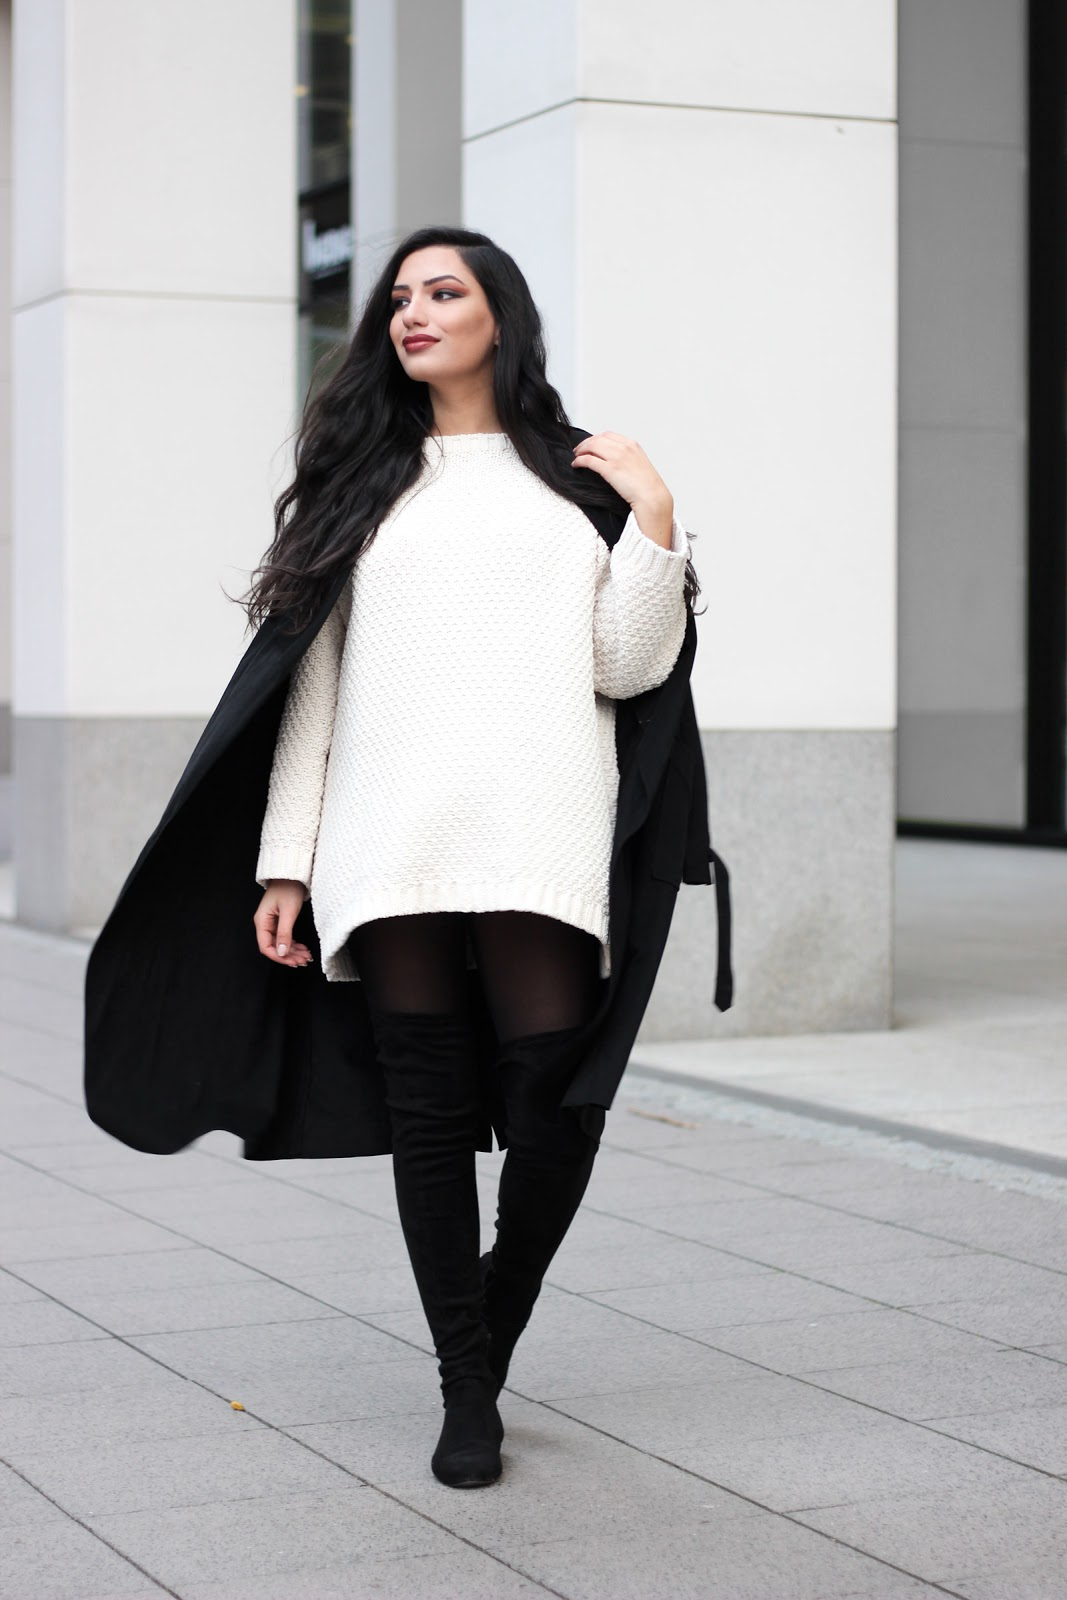 Overknee Stiefel + Oversized Strickpullover – Fashion Blog